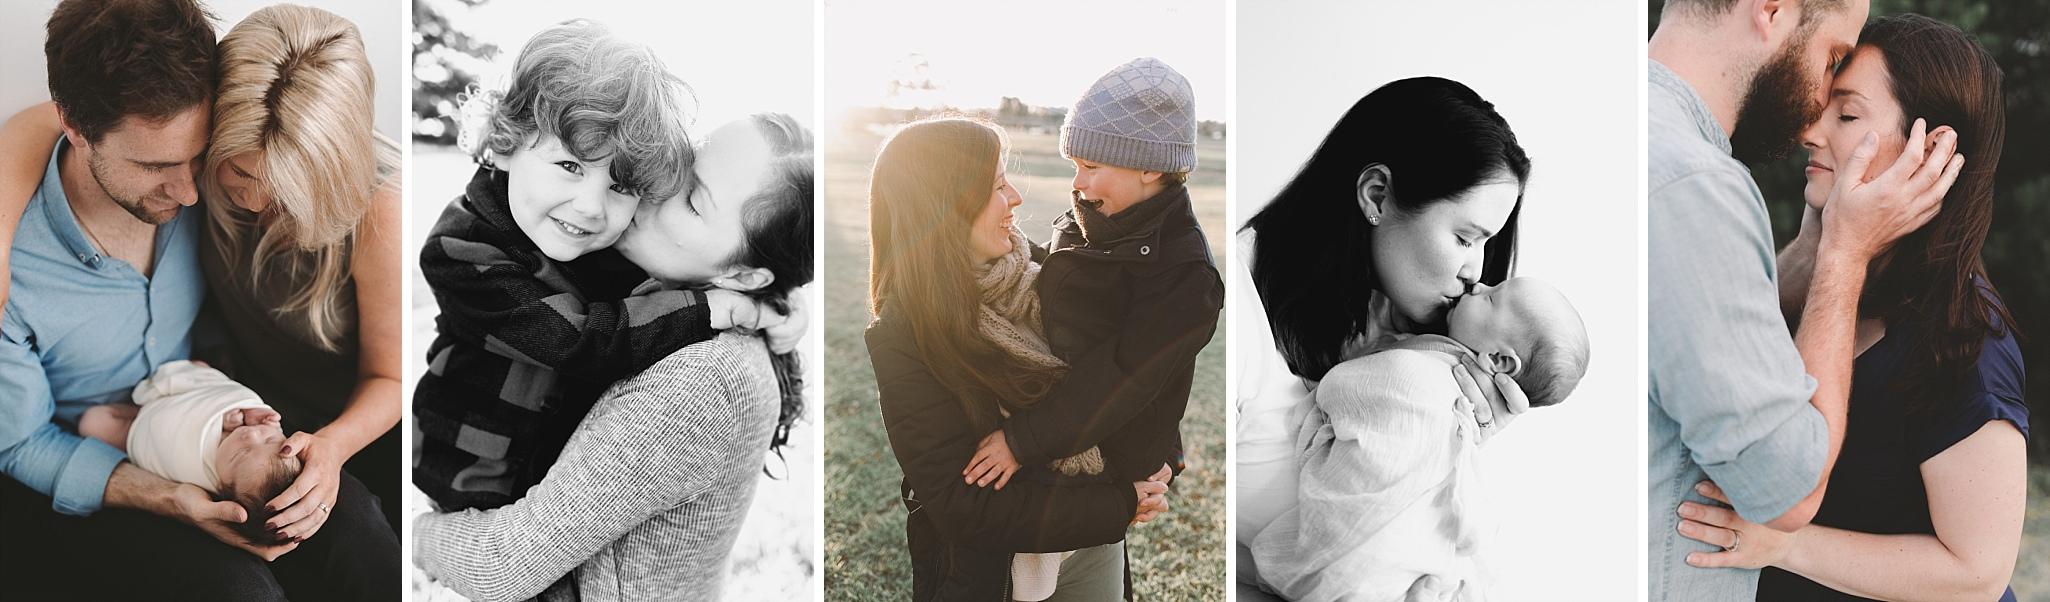 Lecinda Ward, Melbourne Family Newborn and Wedding Photographer_0089.jpg